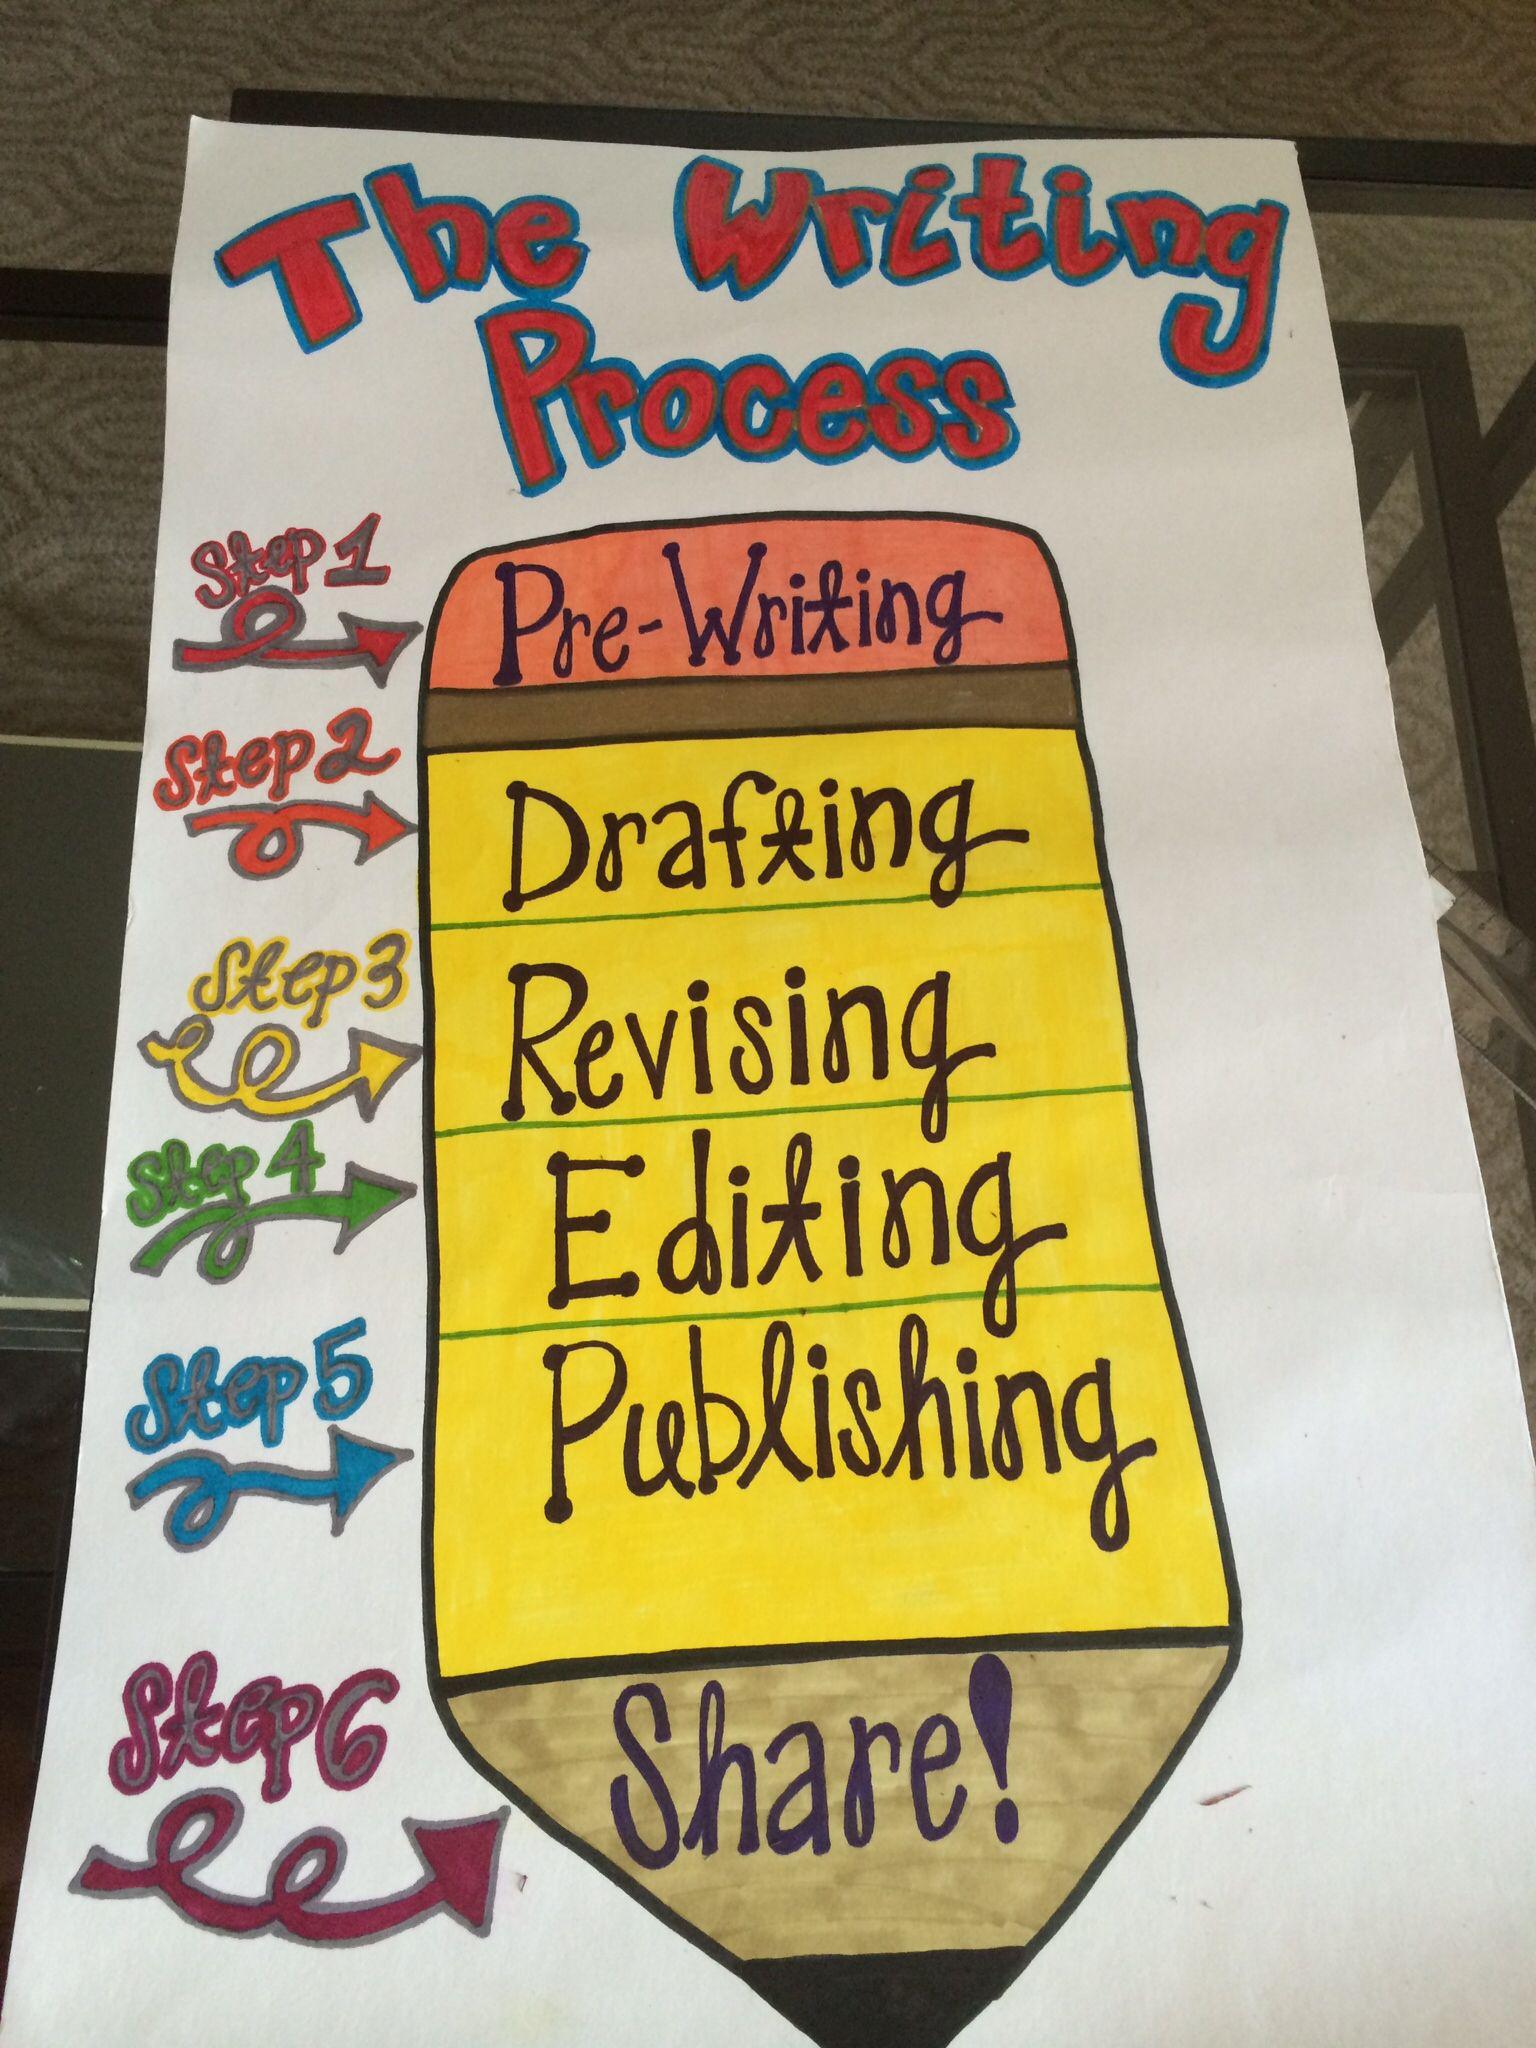 3rd grade writing process The writing process, writing, third grade english language arts standards, grade level help, internet 4 classrooms internet resources, teachers, students.